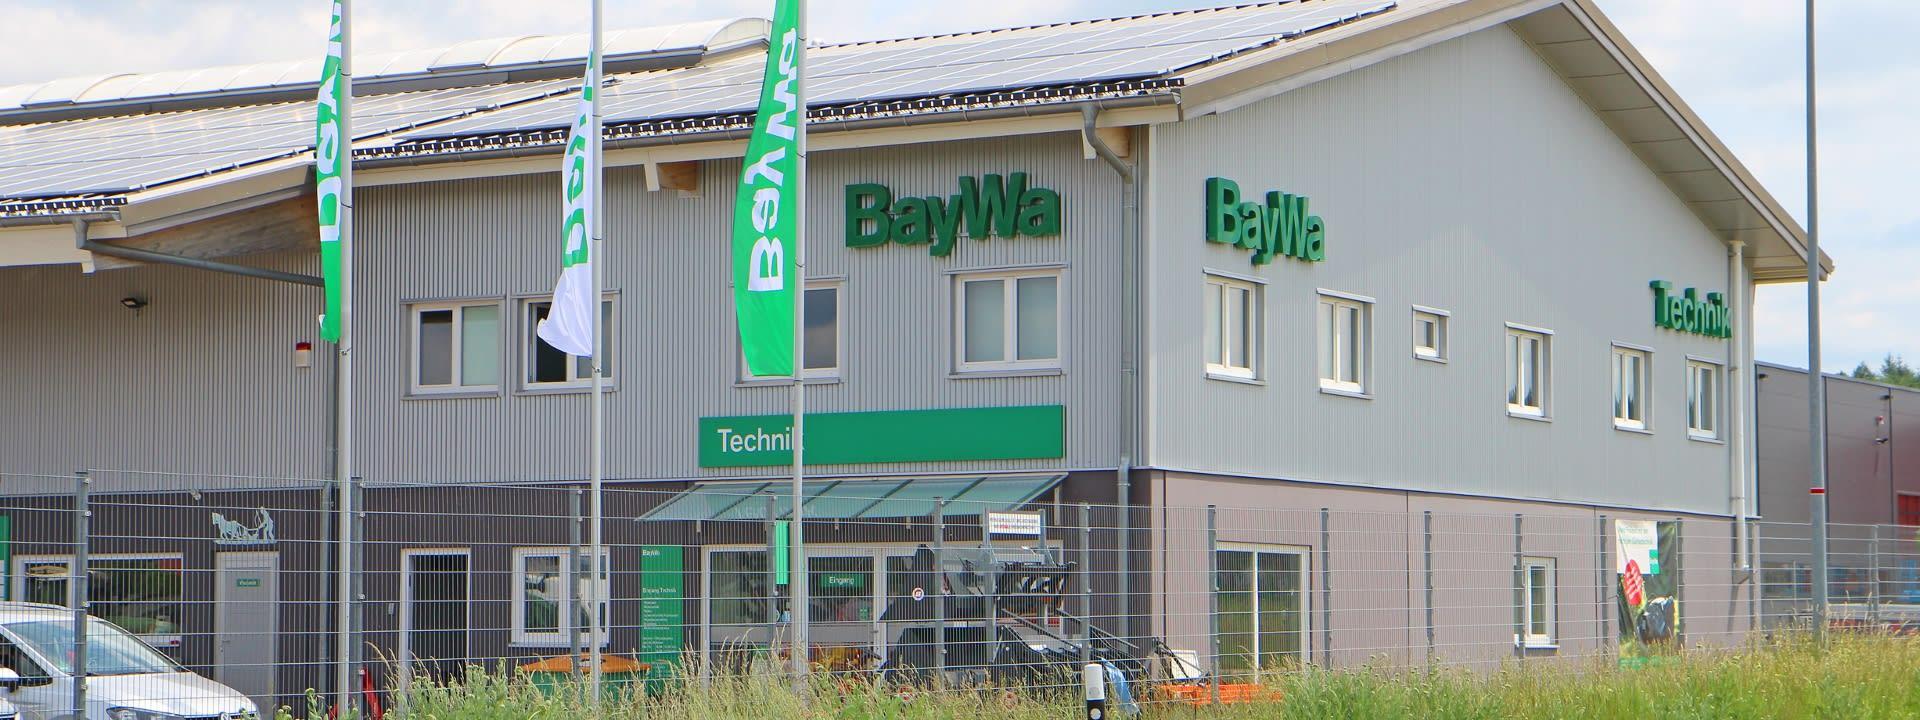 BayWa Technik Eggenfelden